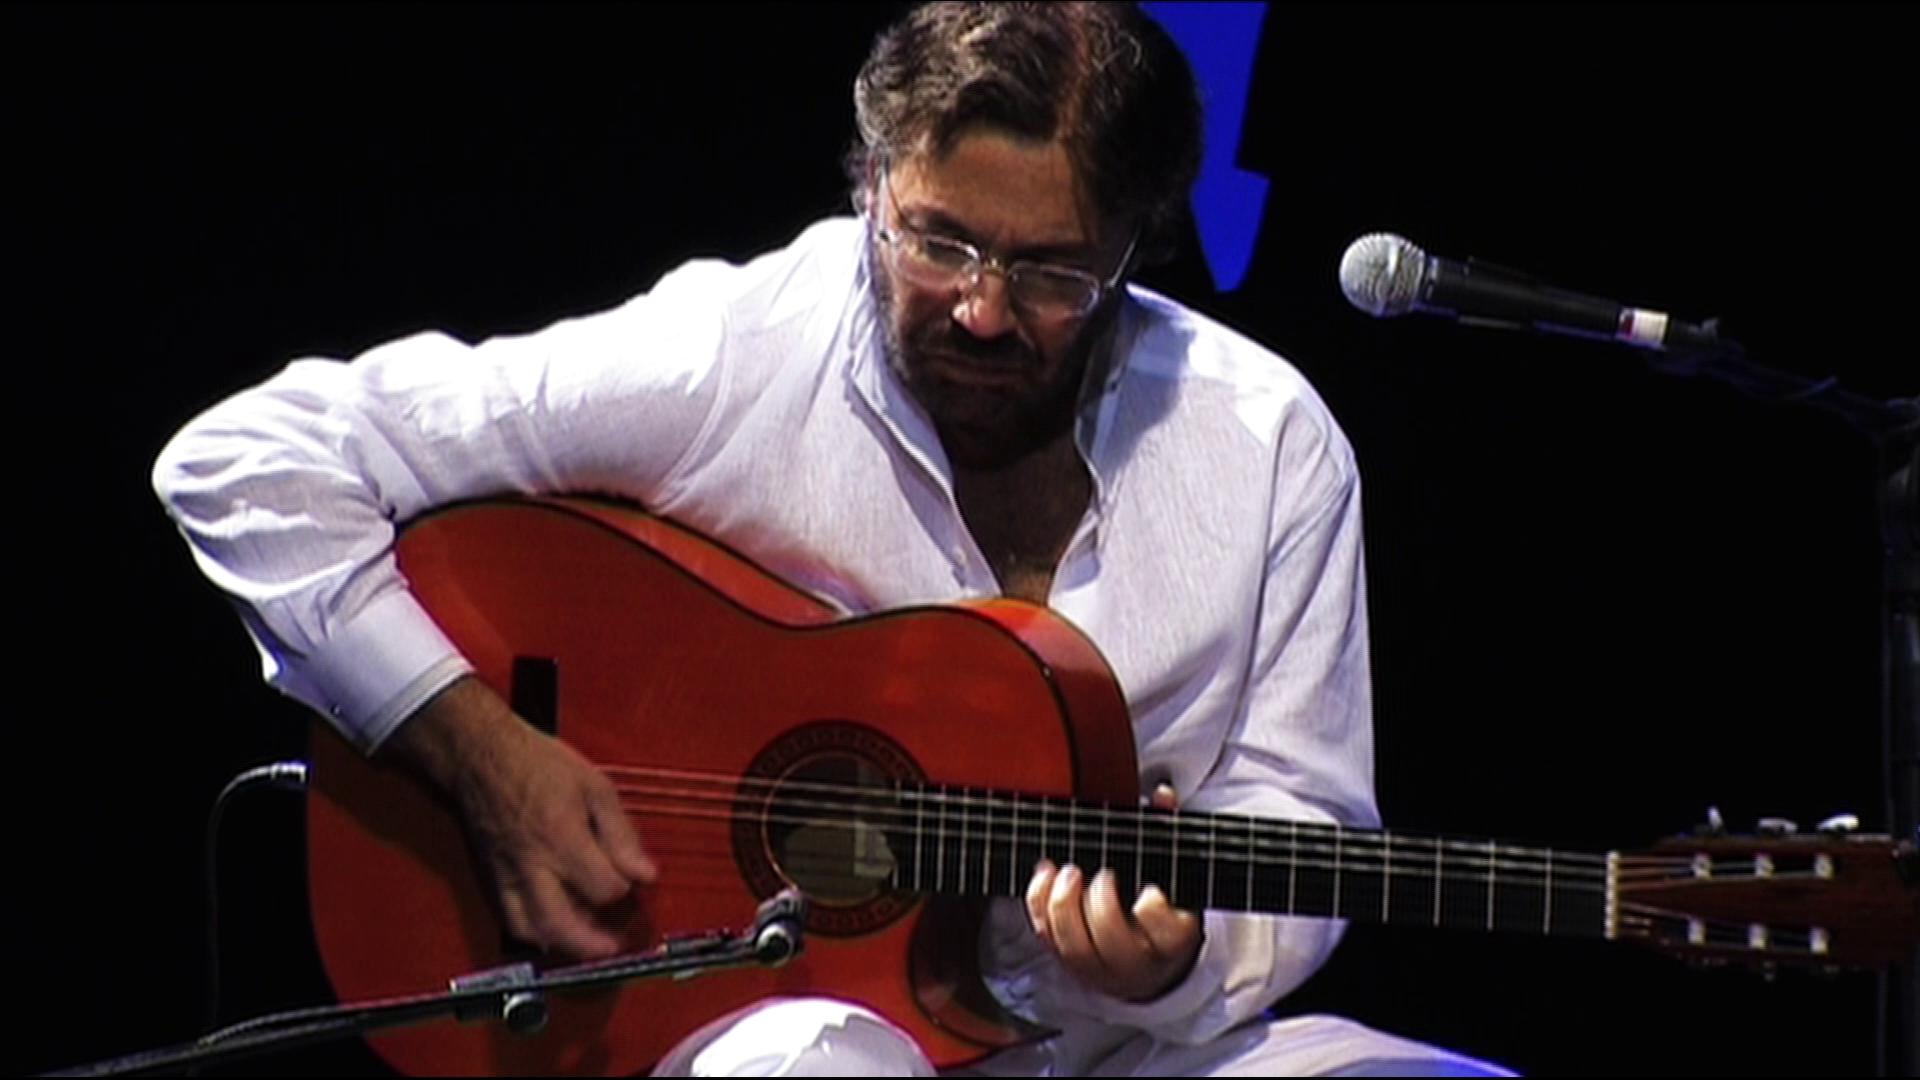 2009 Al Di Meola - Morocco Fantasia - World Sinfonia Live (2012) [Blu-ray] 6